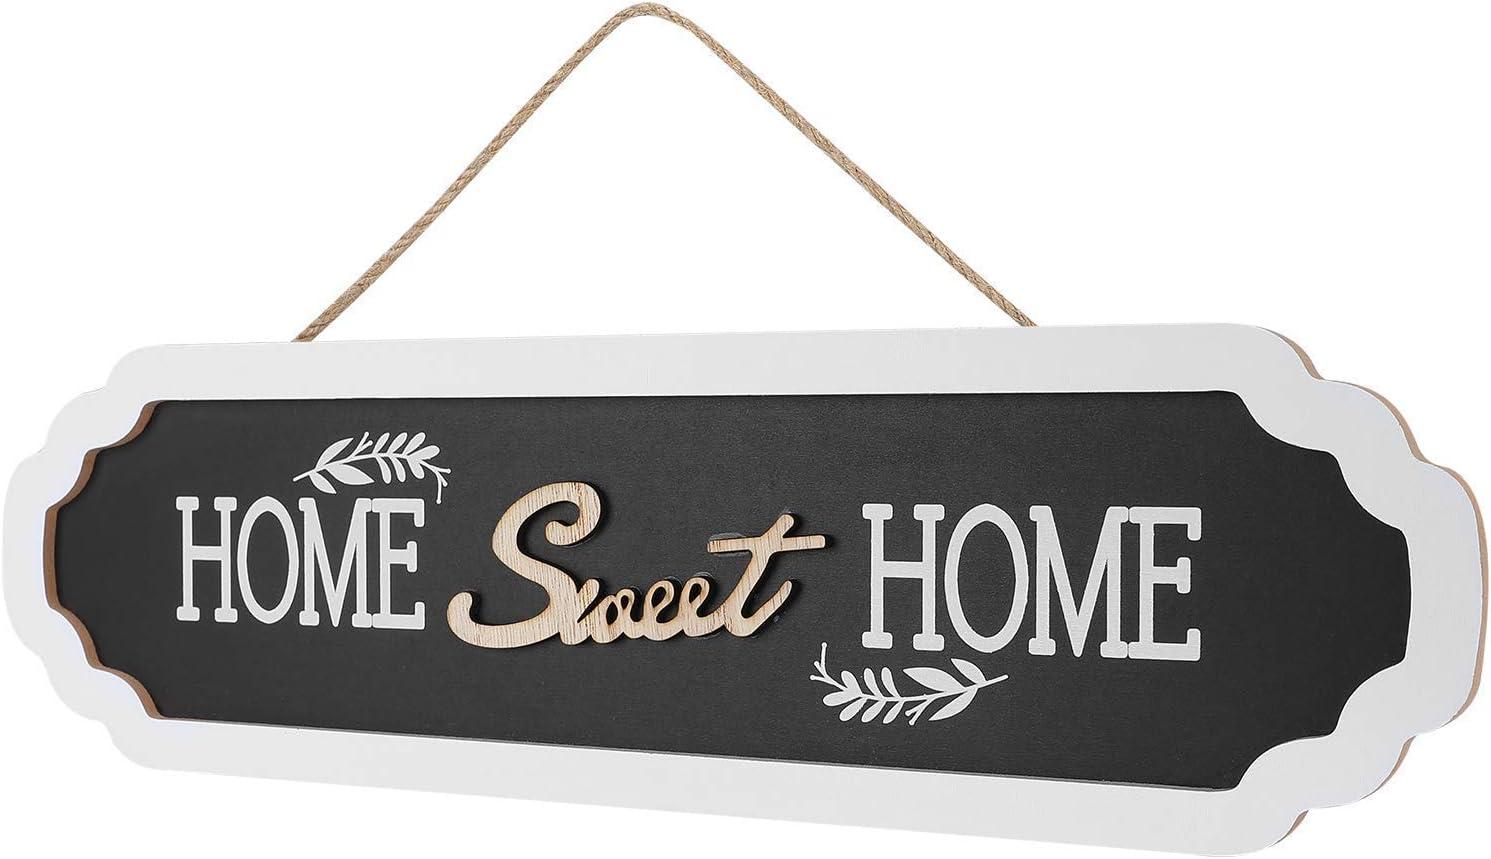 Lohifor Home Sweet Home Sign Wall Decor - Wall Hanging Home Sweet Home Decor Sign, 4.6